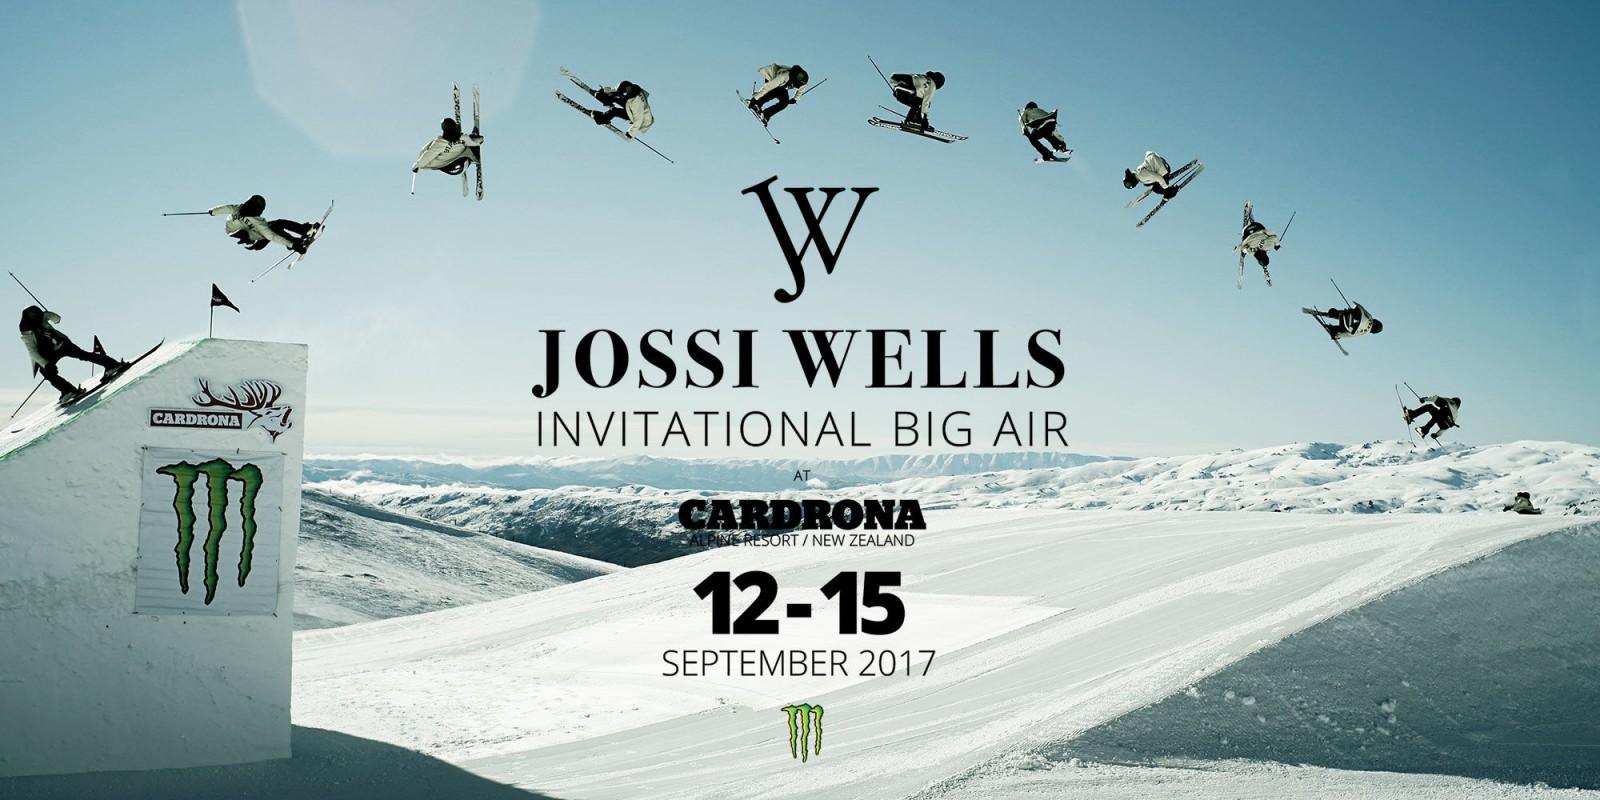 2017 Web Jossi Wells Invitational Ski Event Hero Image